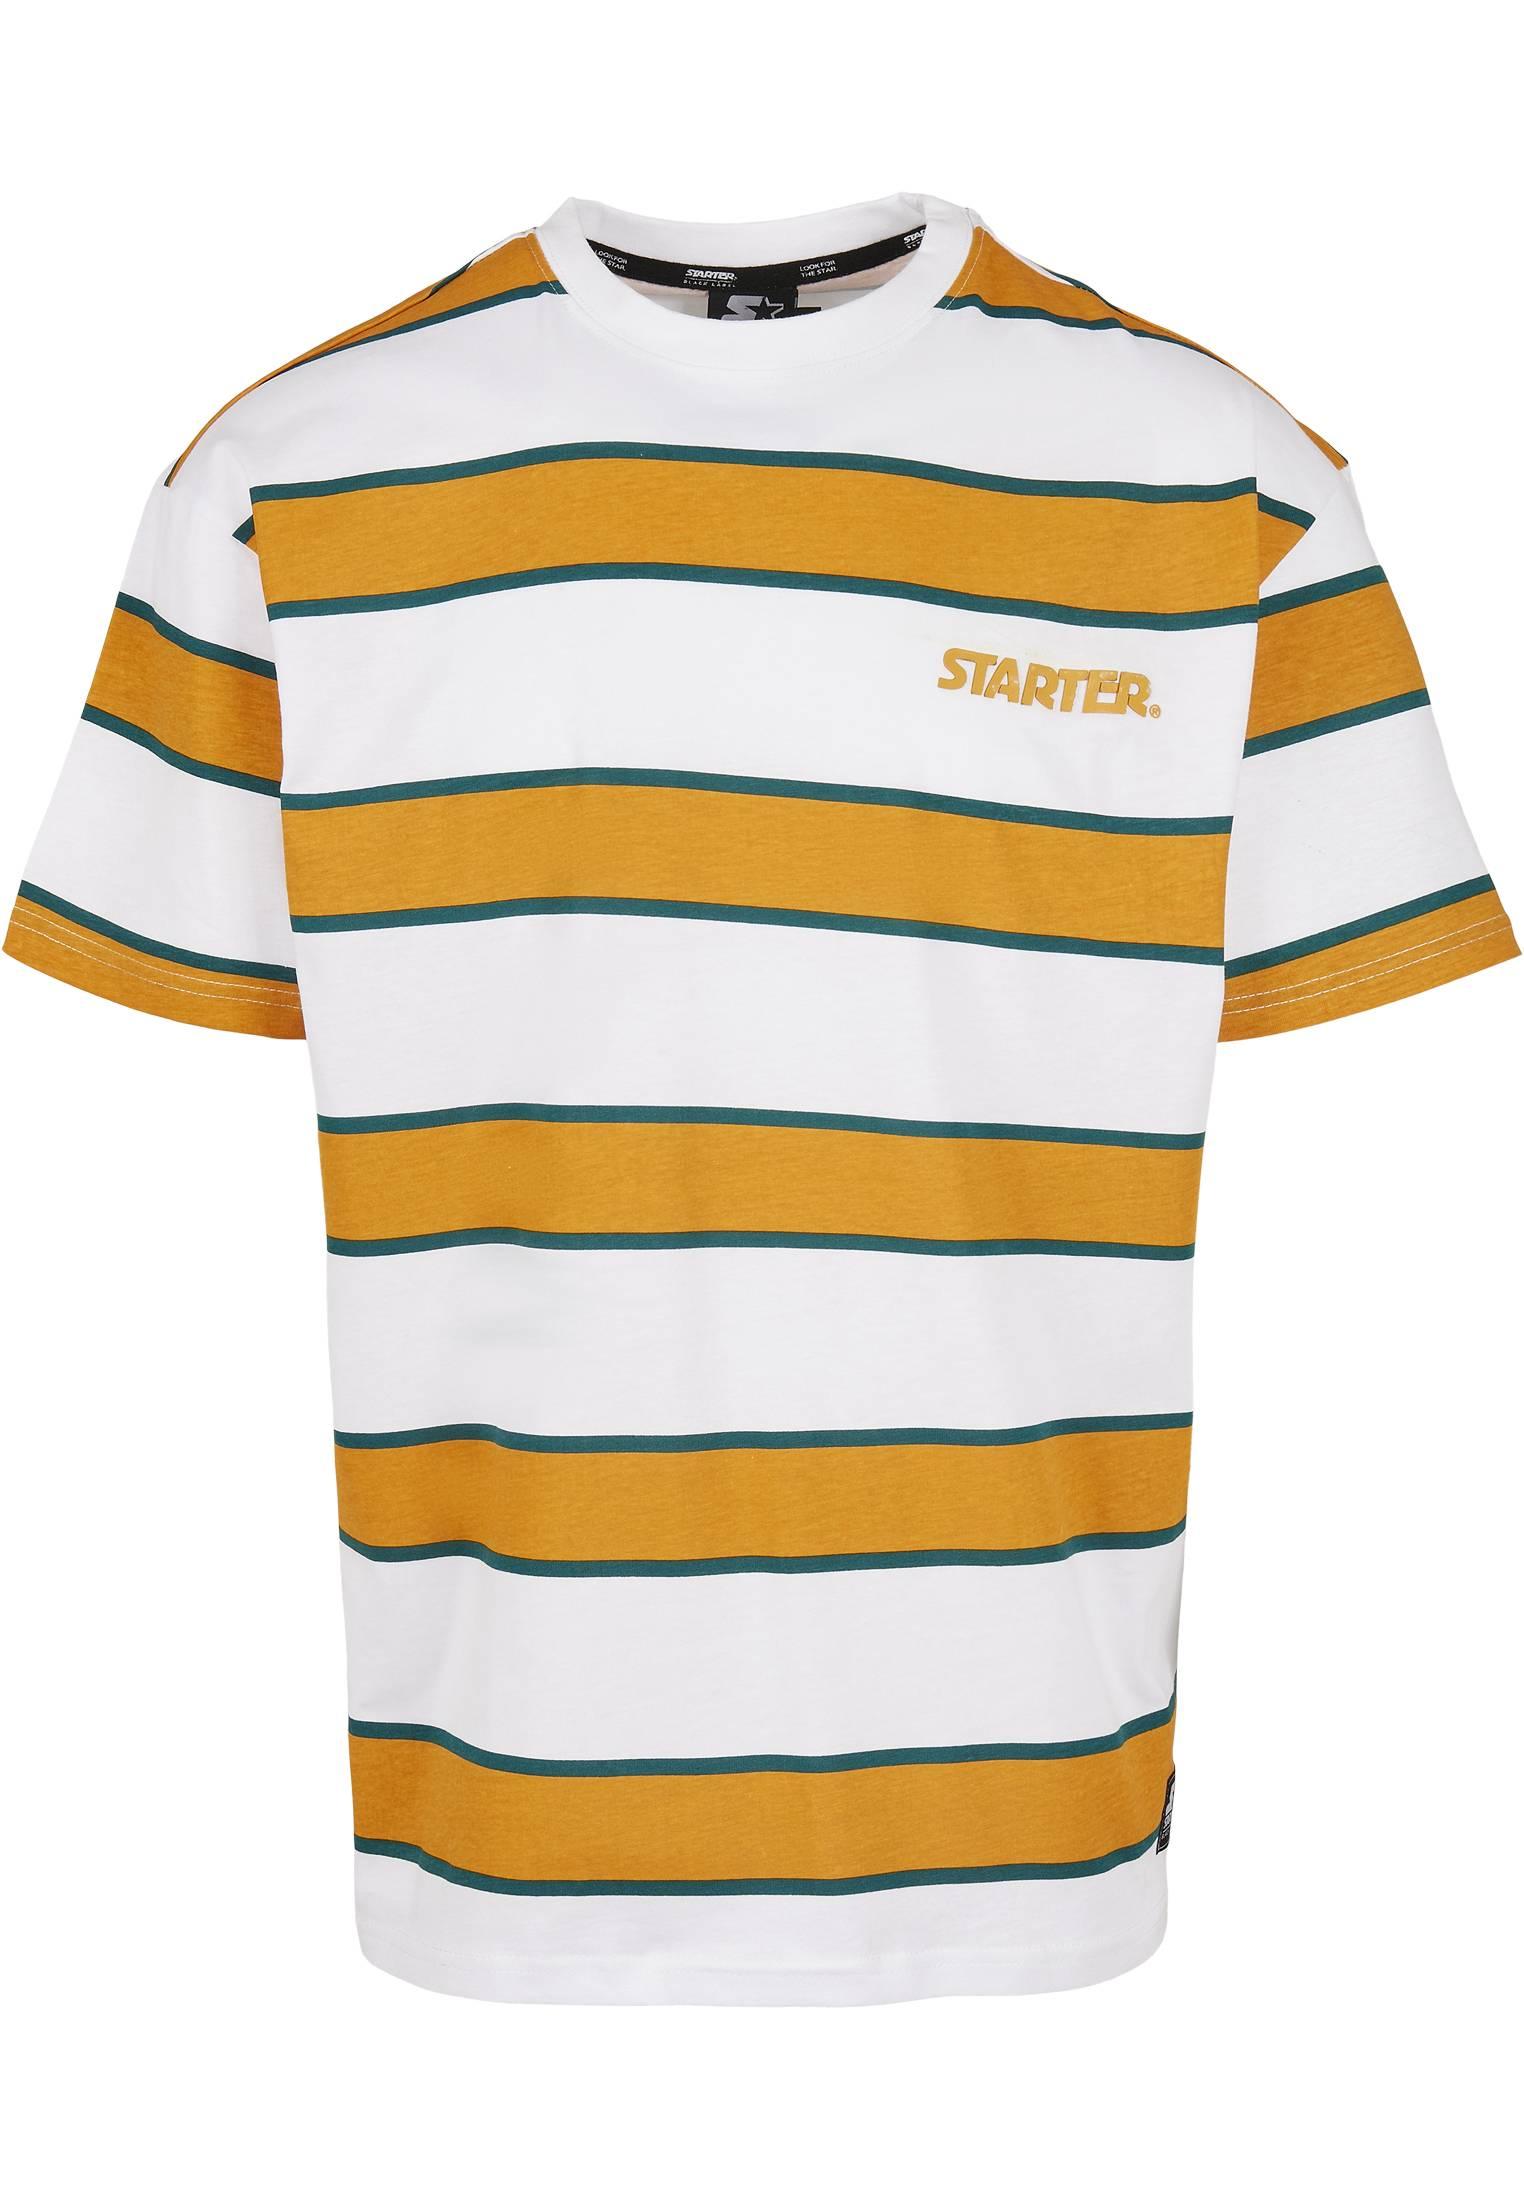 Urban Classics Starter Logo Striped Tee white/yellow - L